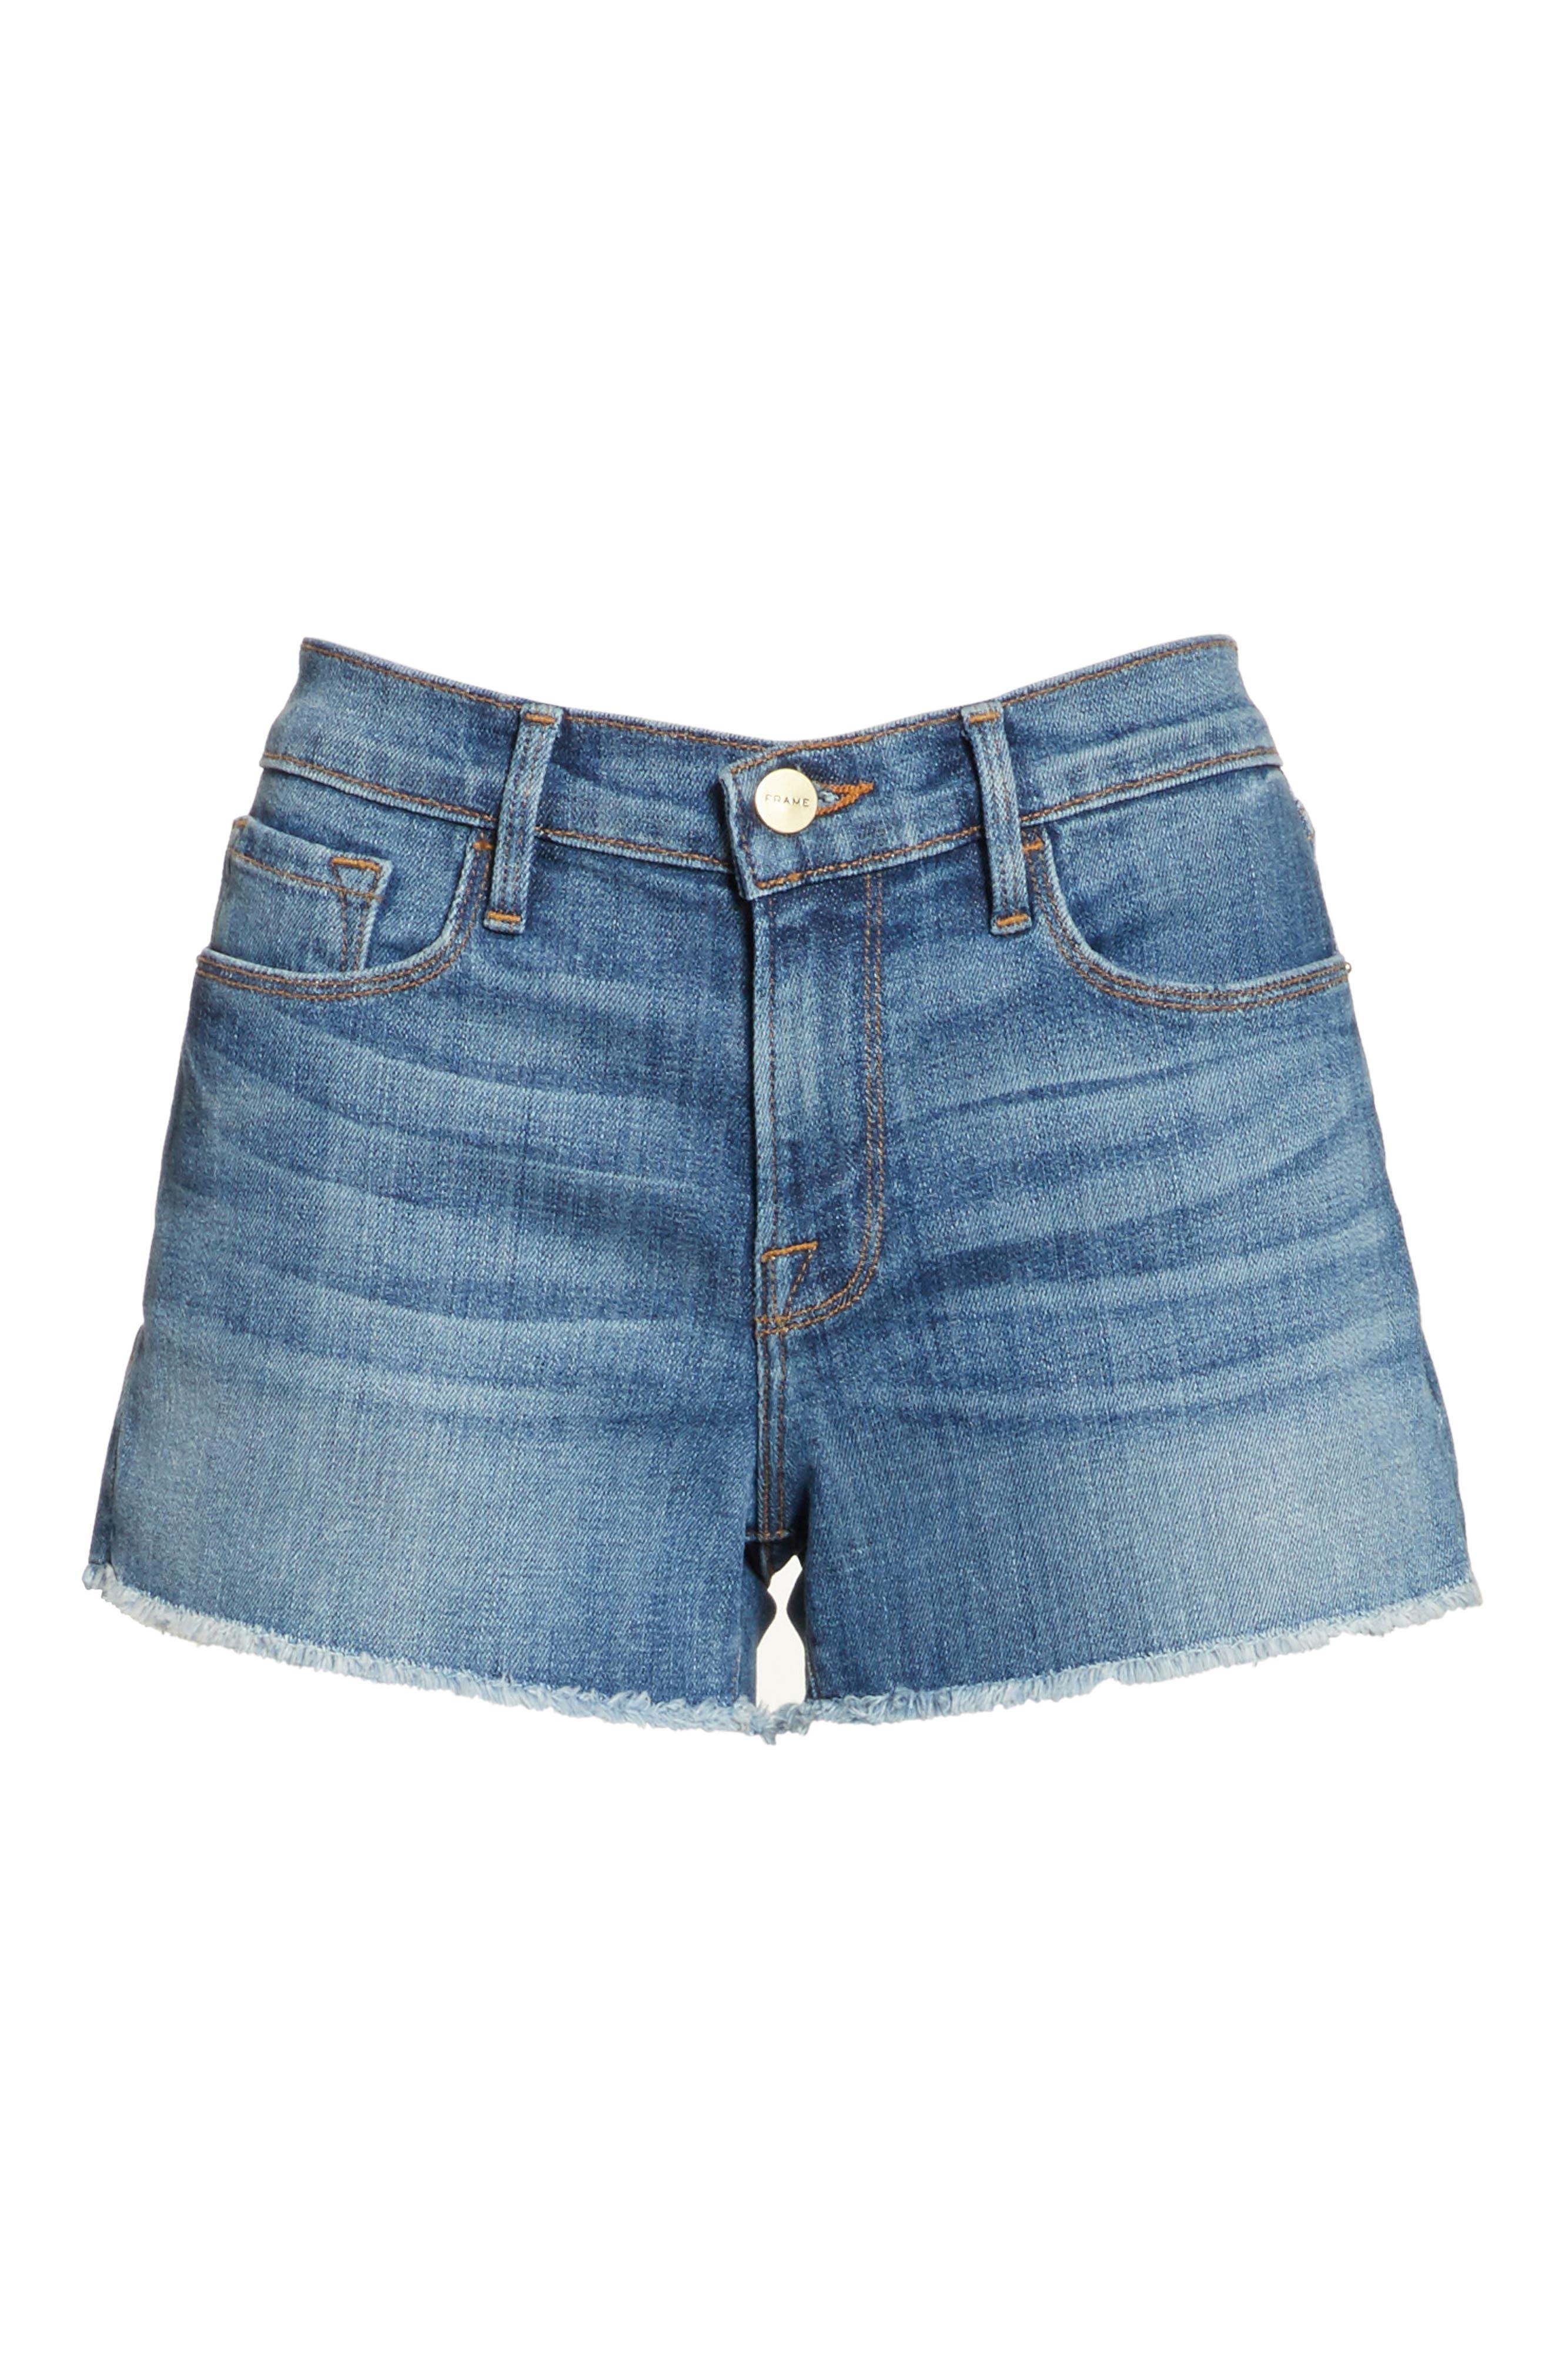 Le Cutoff Denim Shorts,                             Alternate thumbnail 12, color,